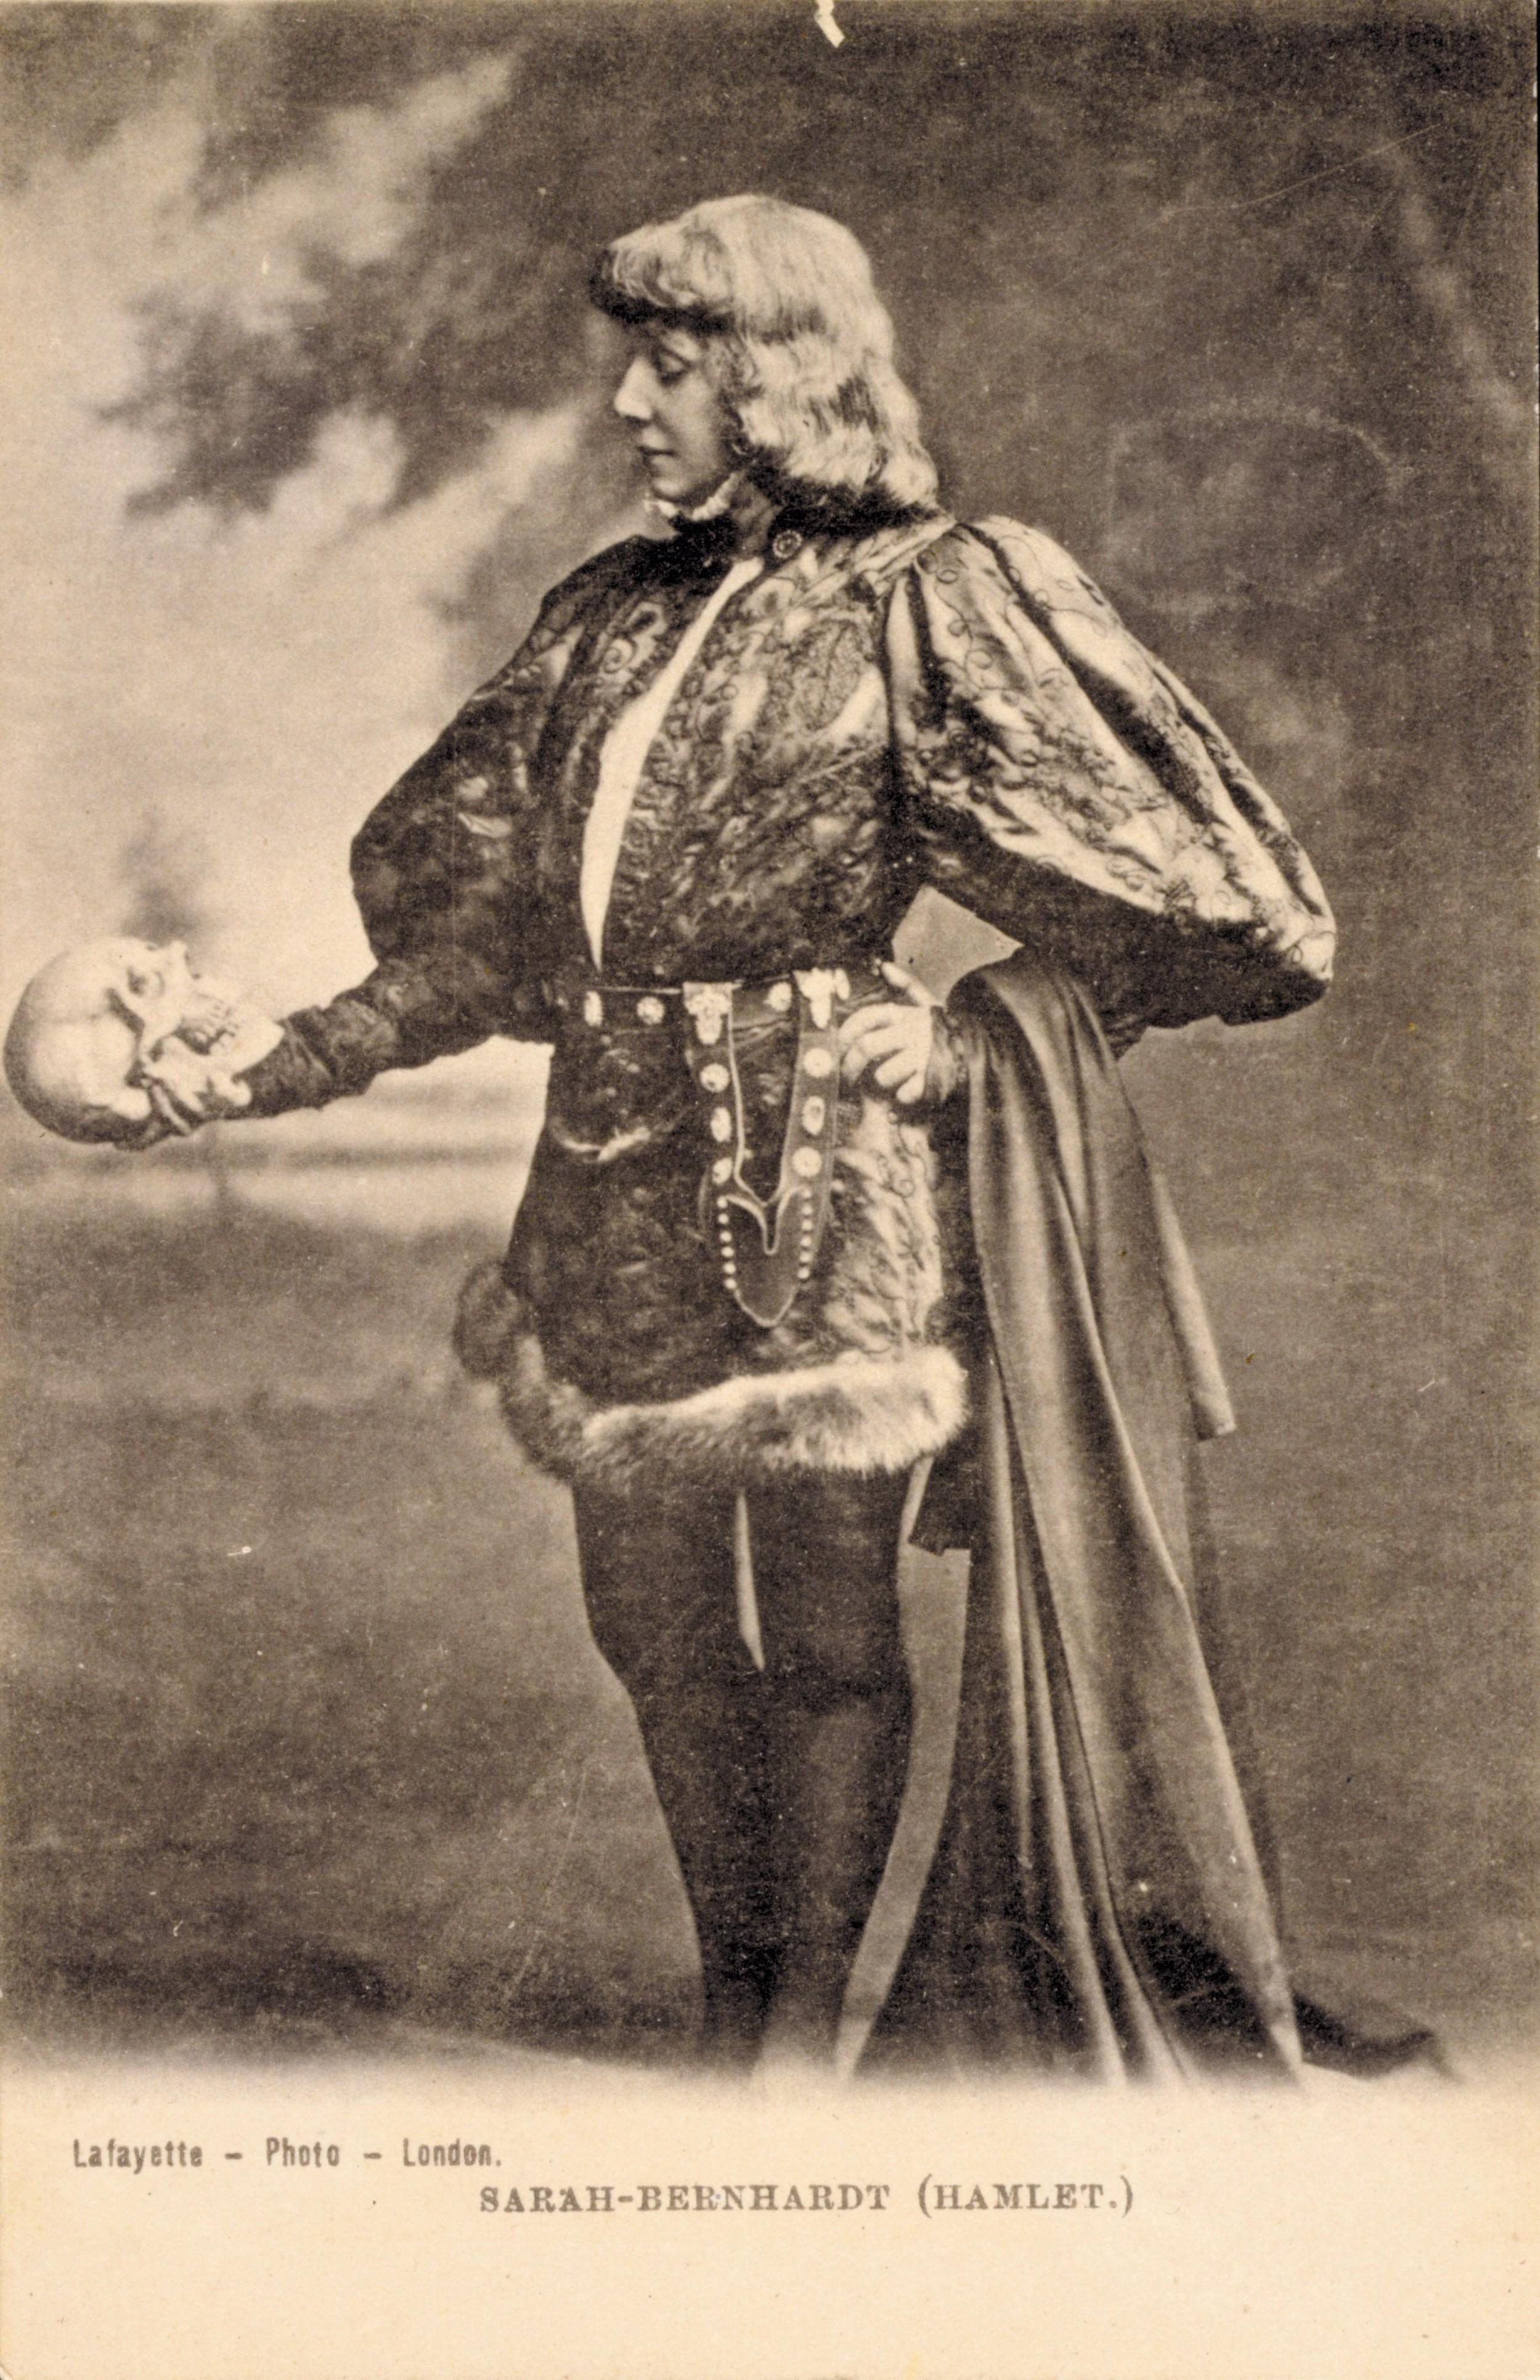 Sarah Bernhardt en Hamlet, 1899, photographie.